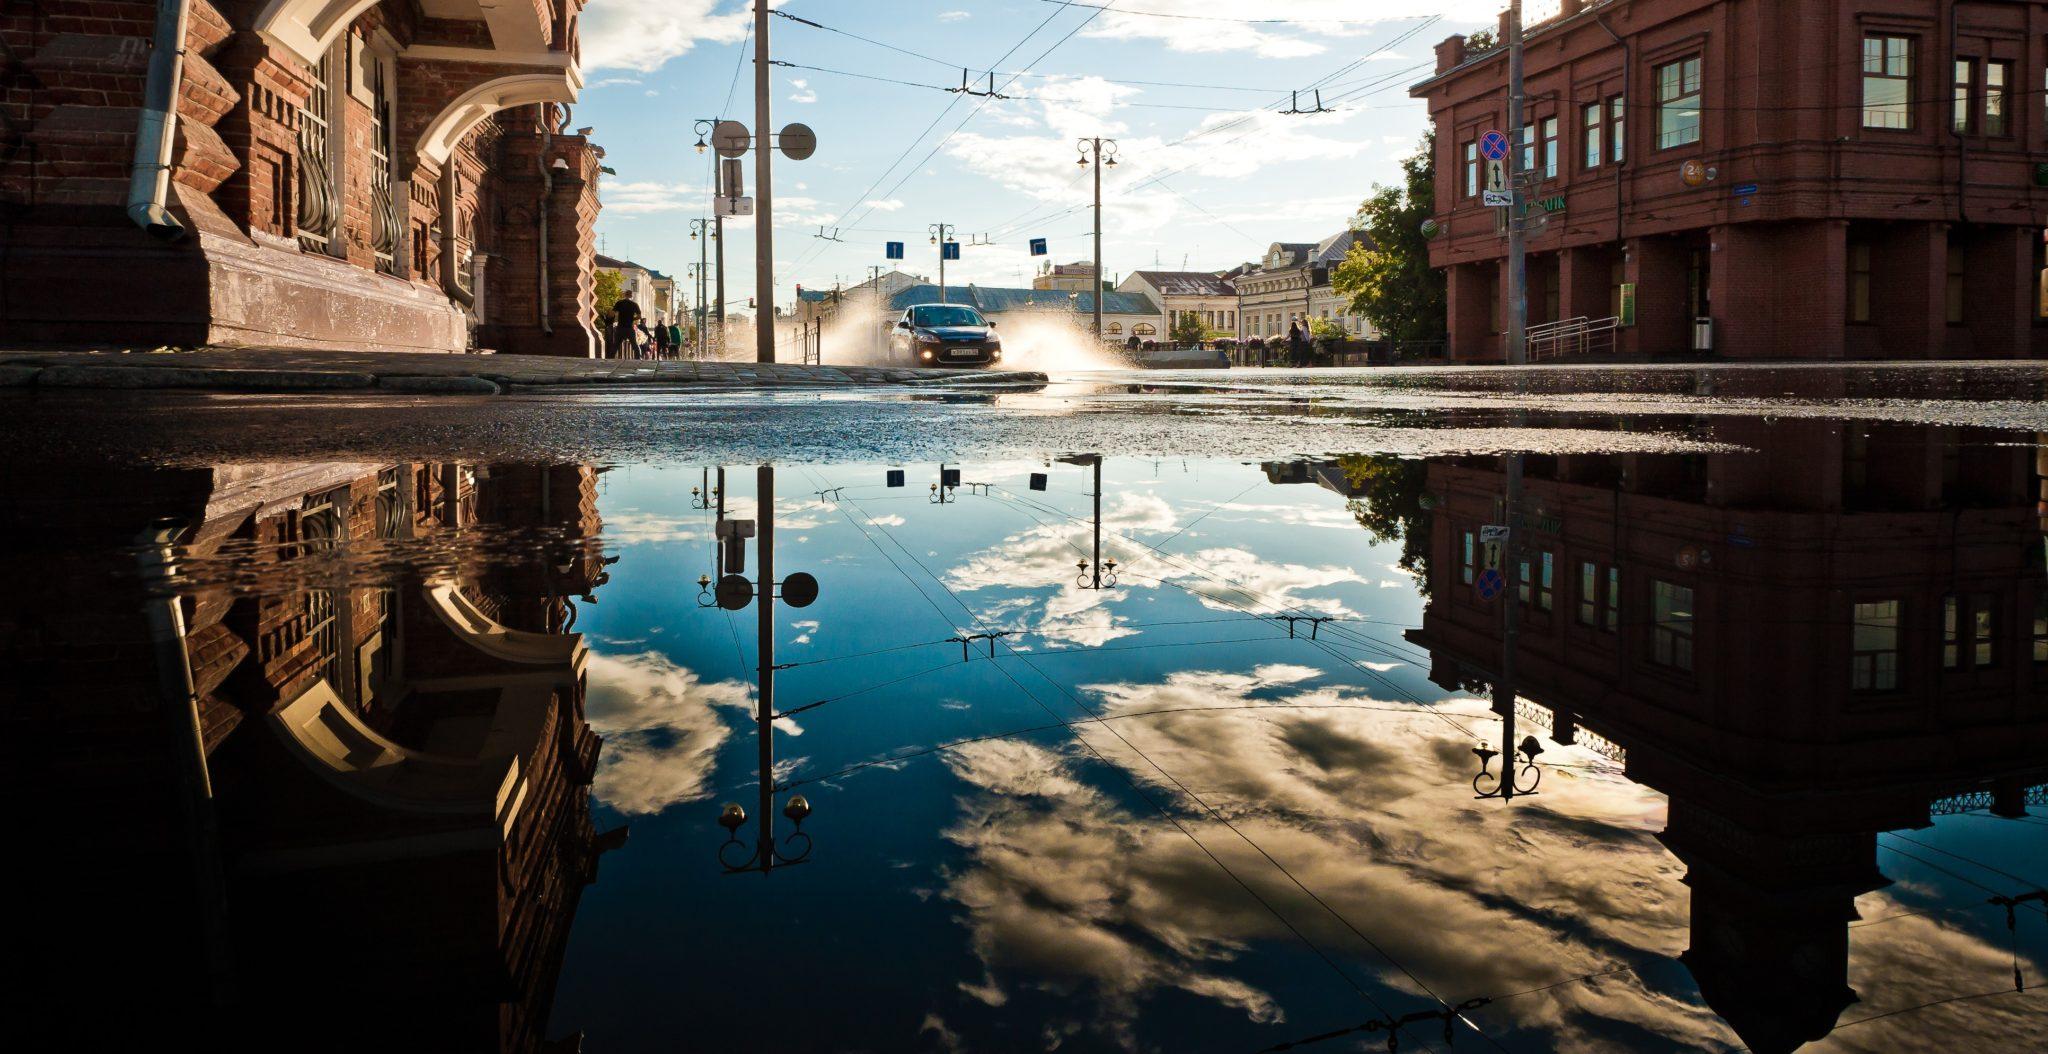 Photo by Vladimir Churchadeev via Unsplash